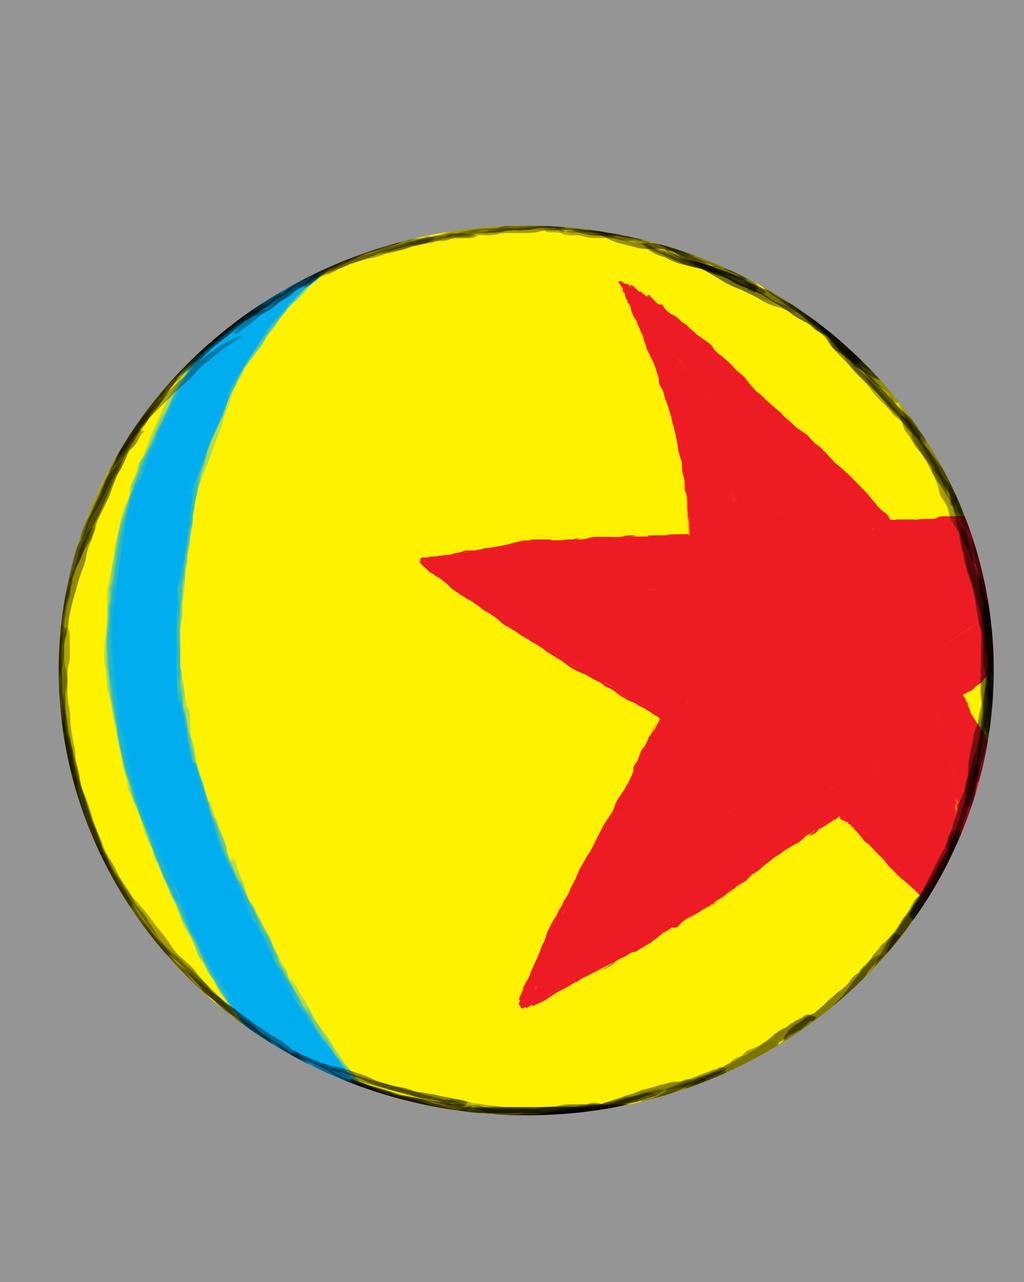 Pixar Ball Daily sketch #424 by GothicVampireFreak